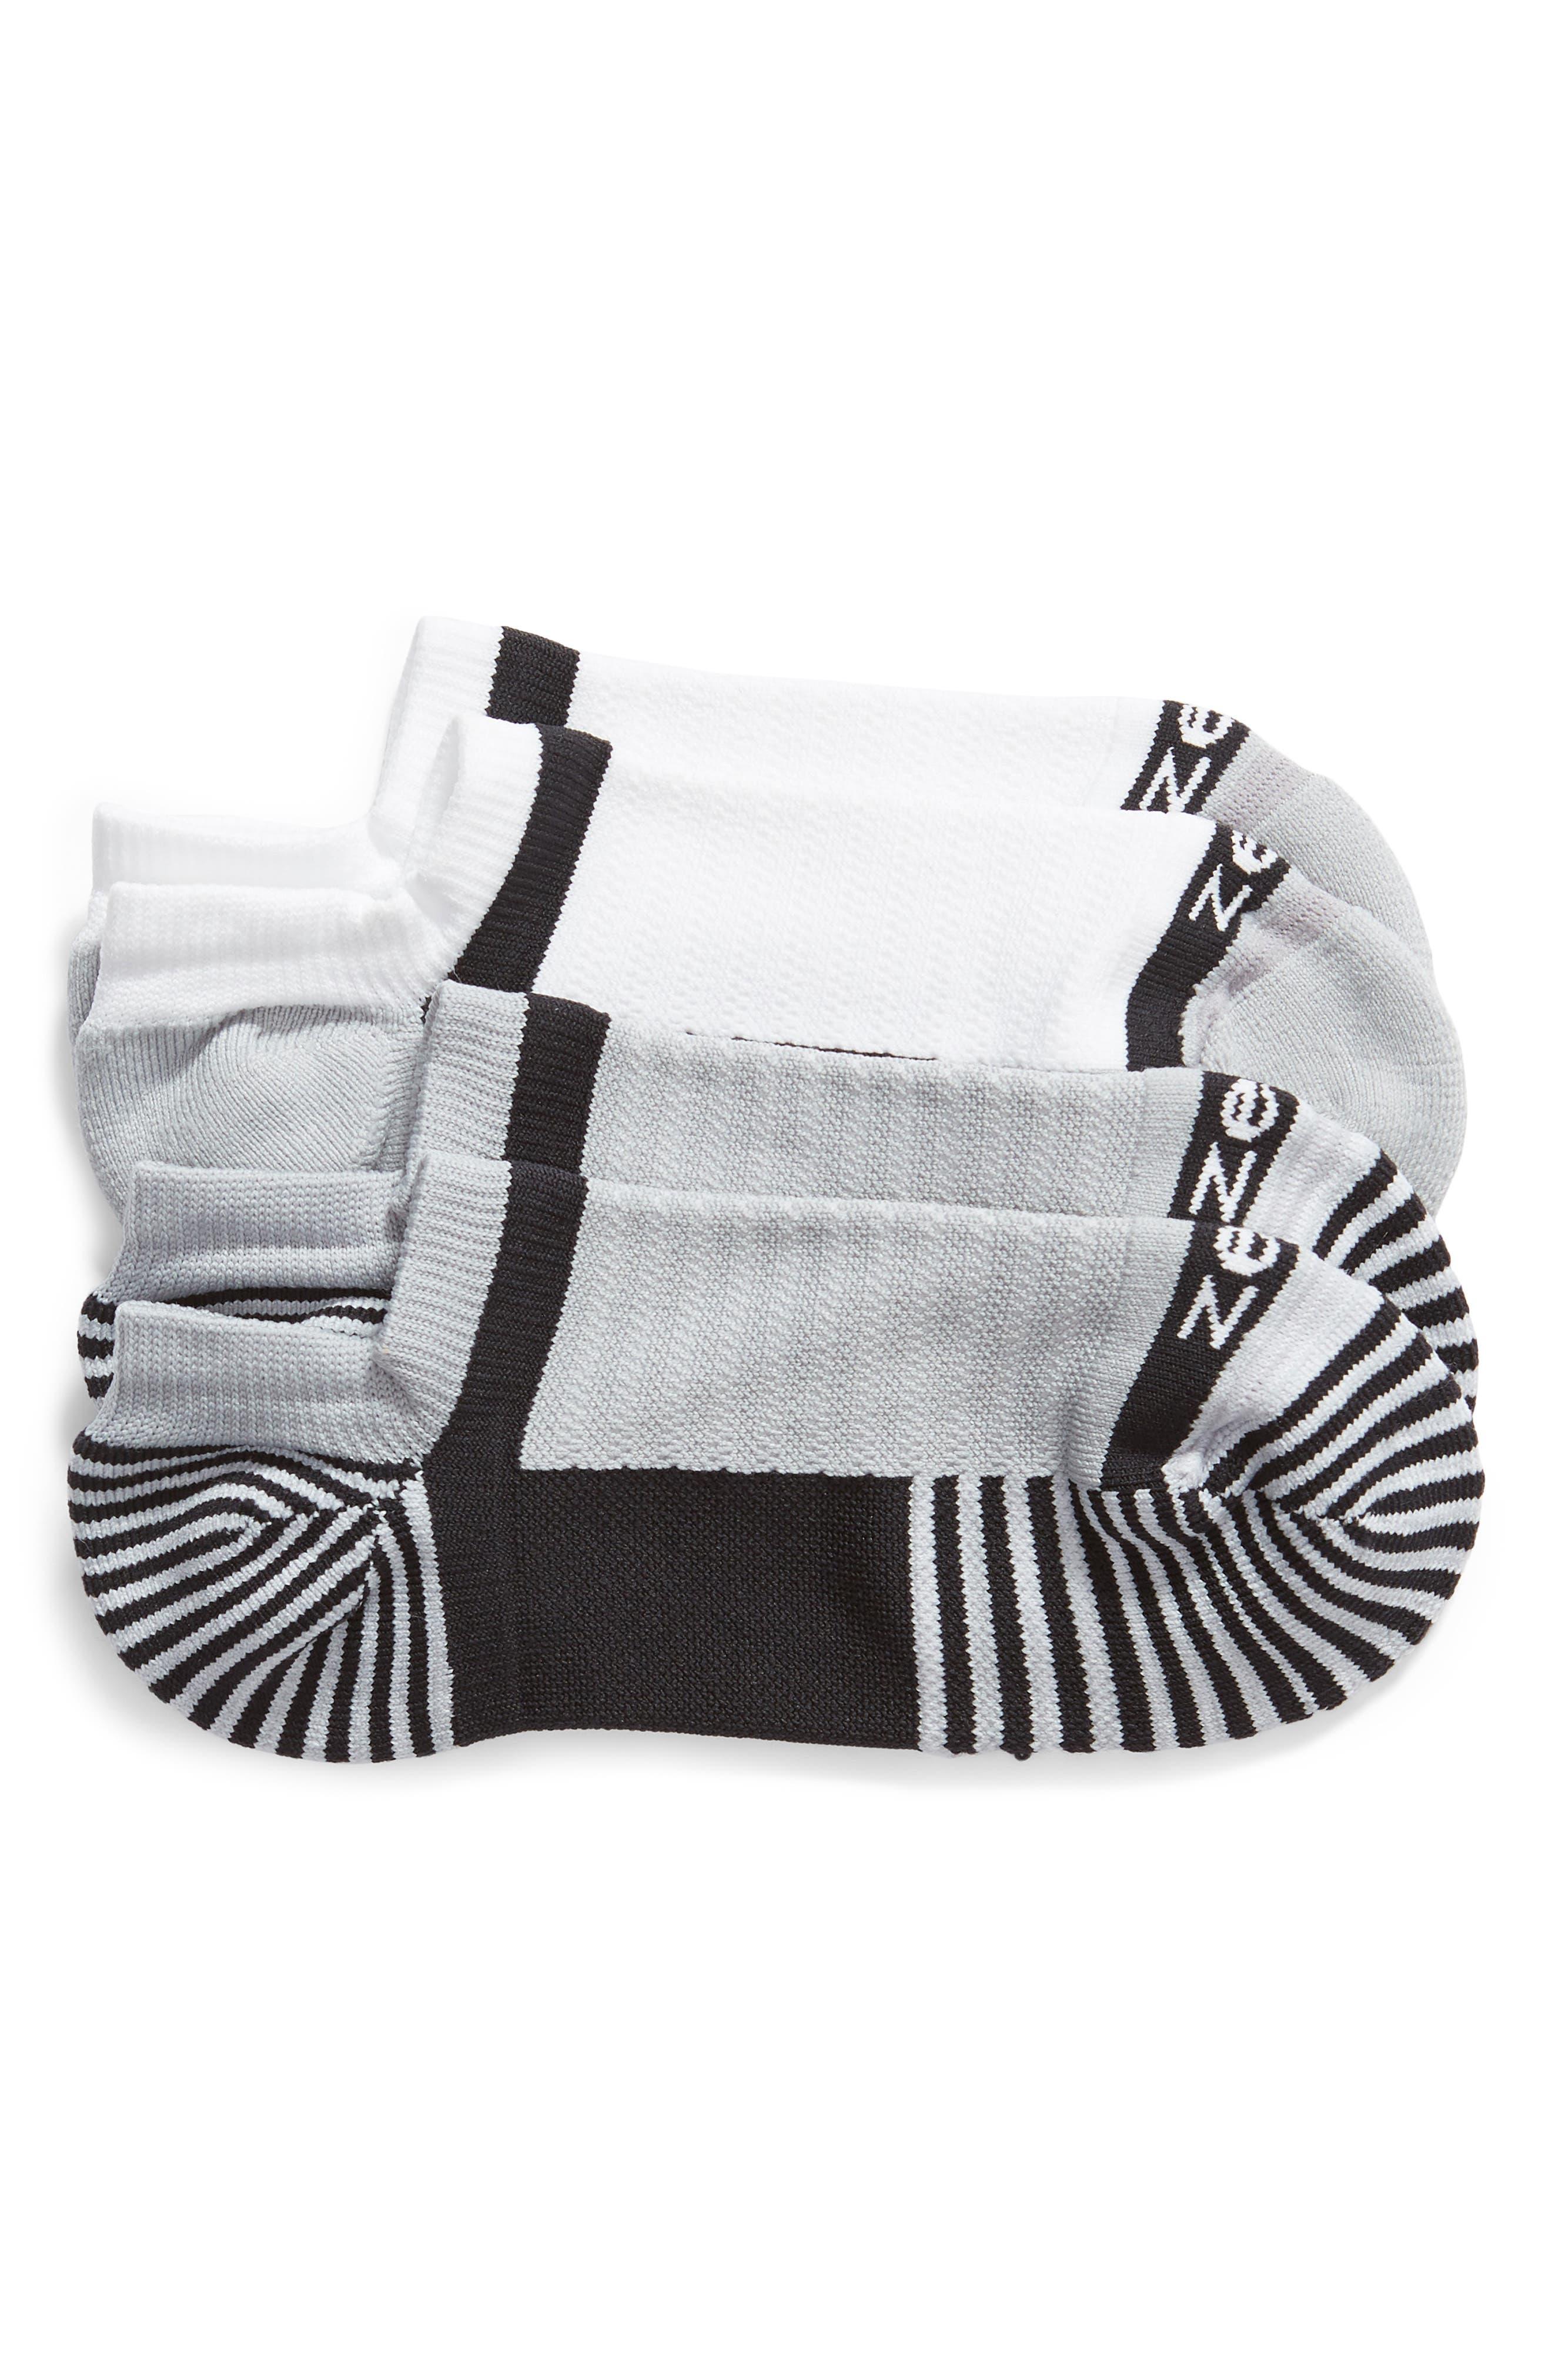 ZELLA Two-Pack Training Socks, Main, color, BLACK